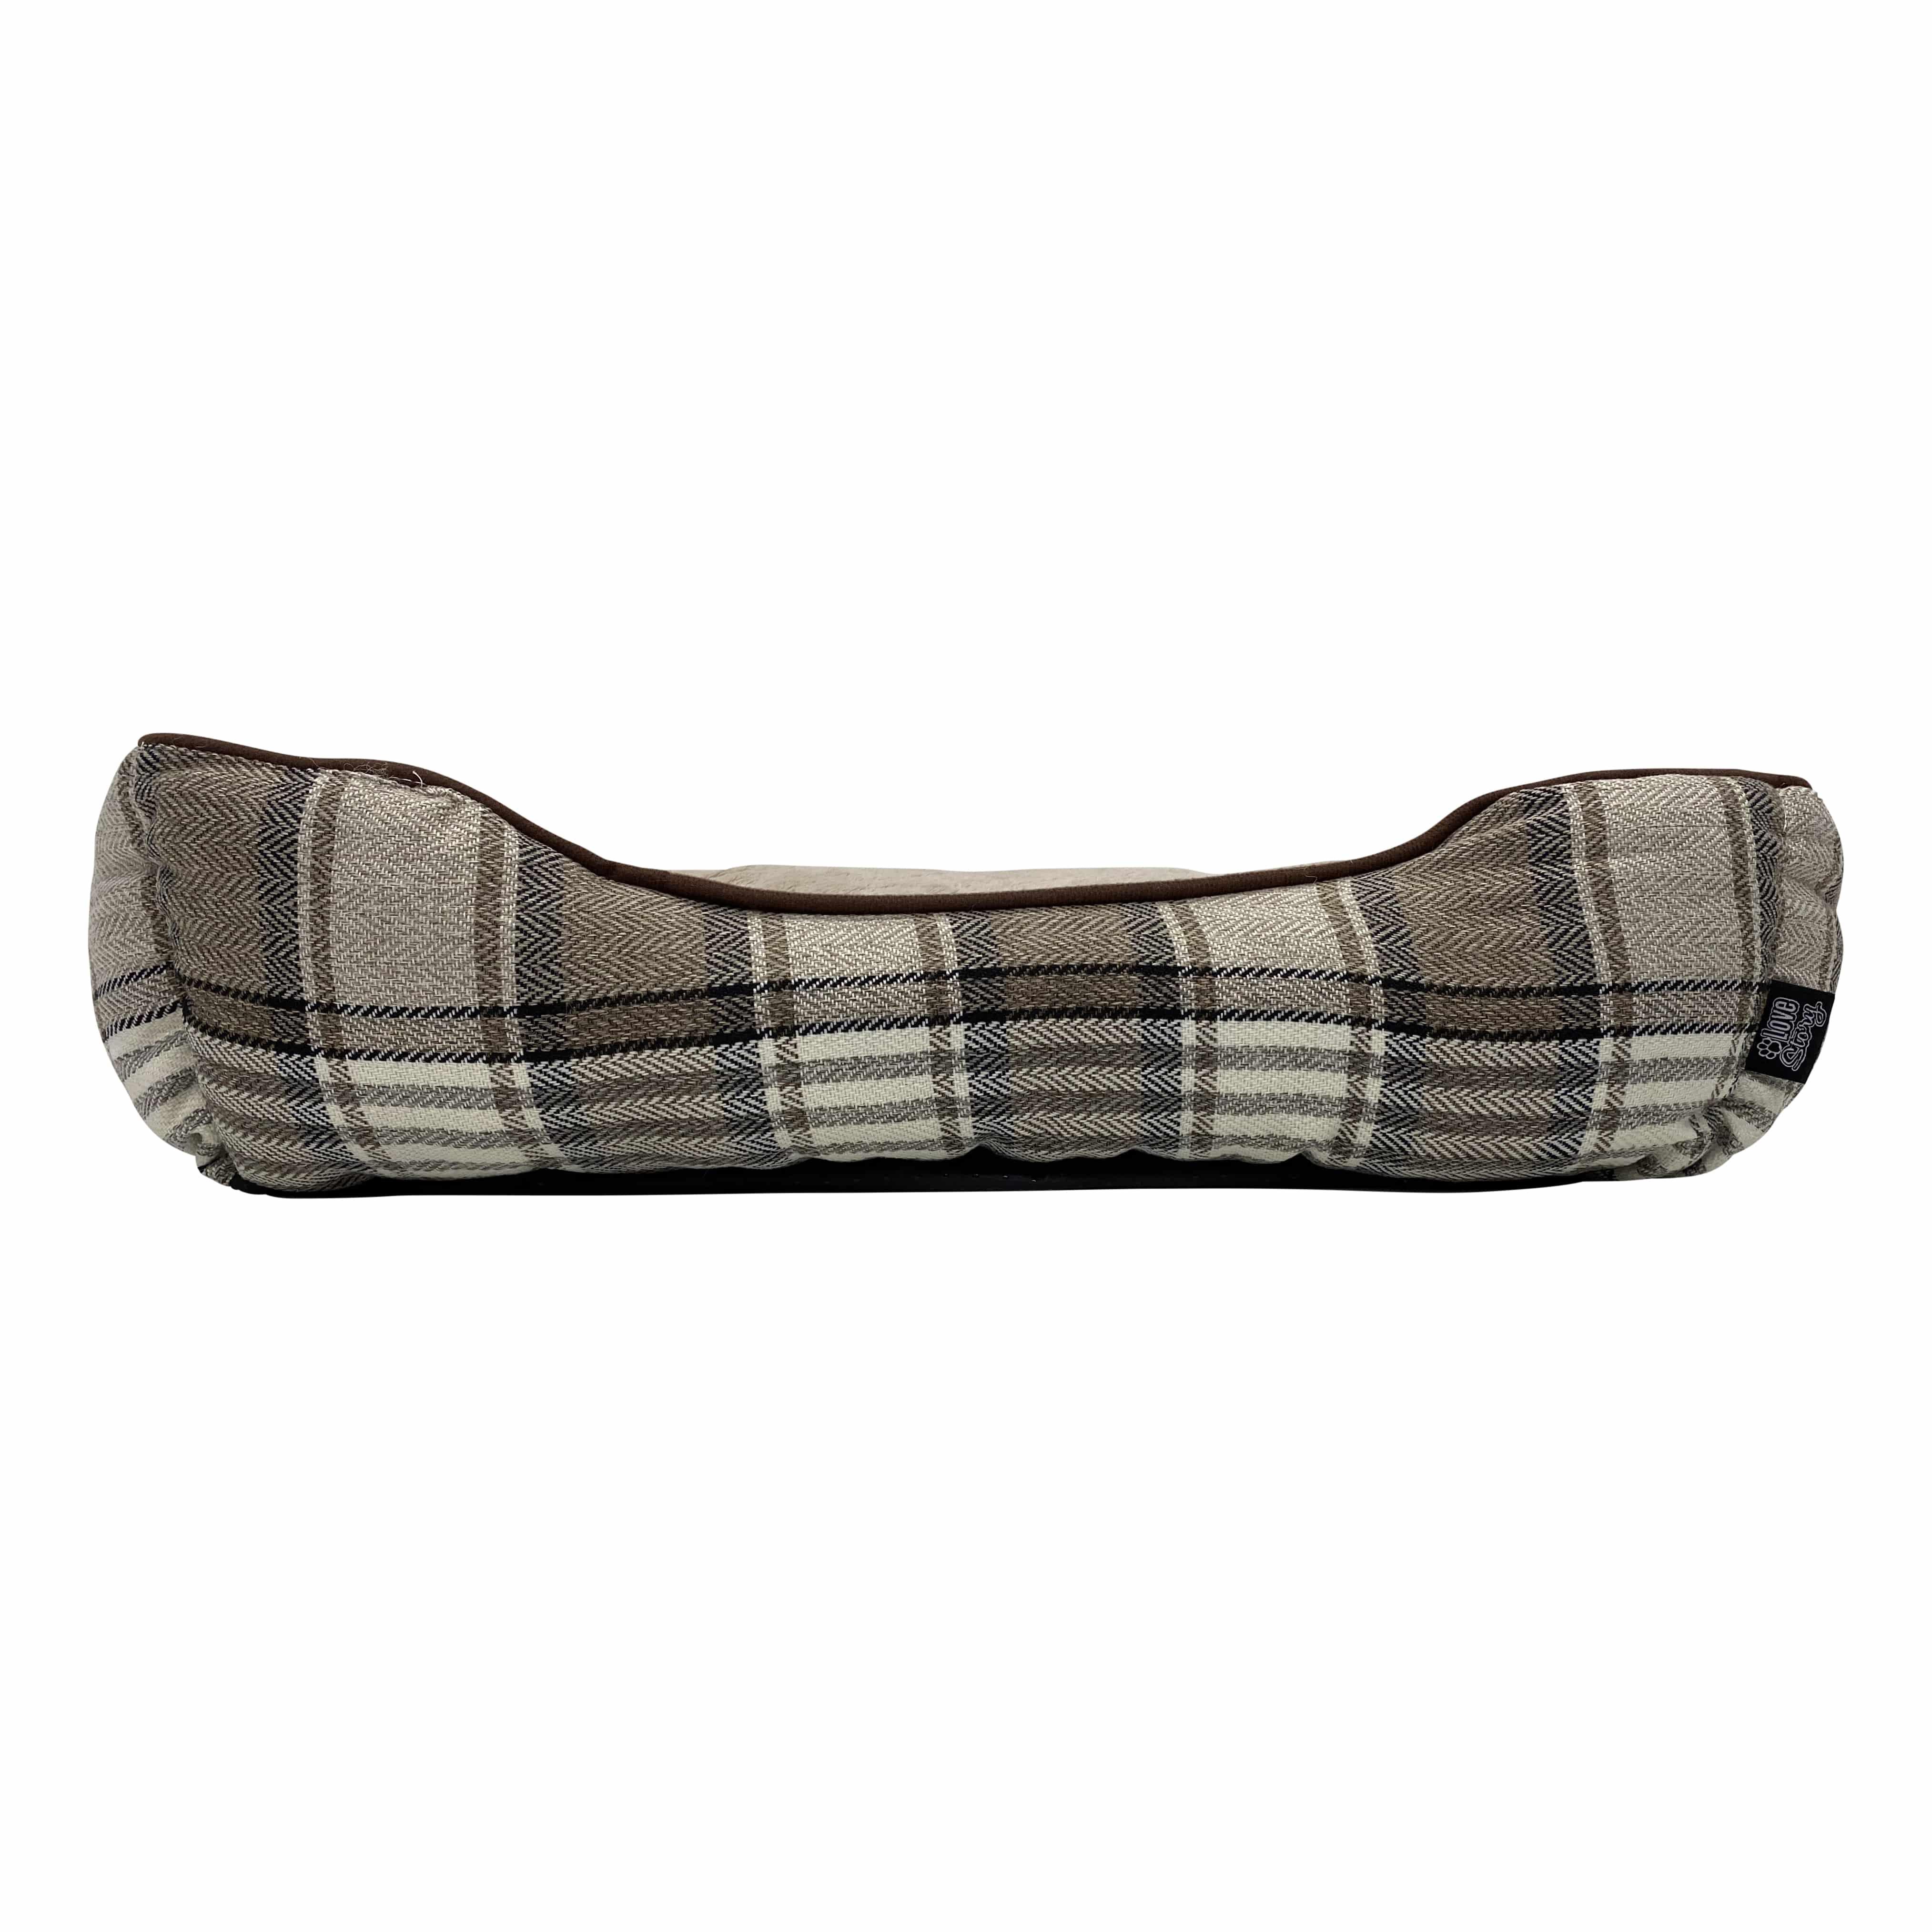 4Goodz hondenmand rechthoekig schotse ruit -73x60 cm - Taupe